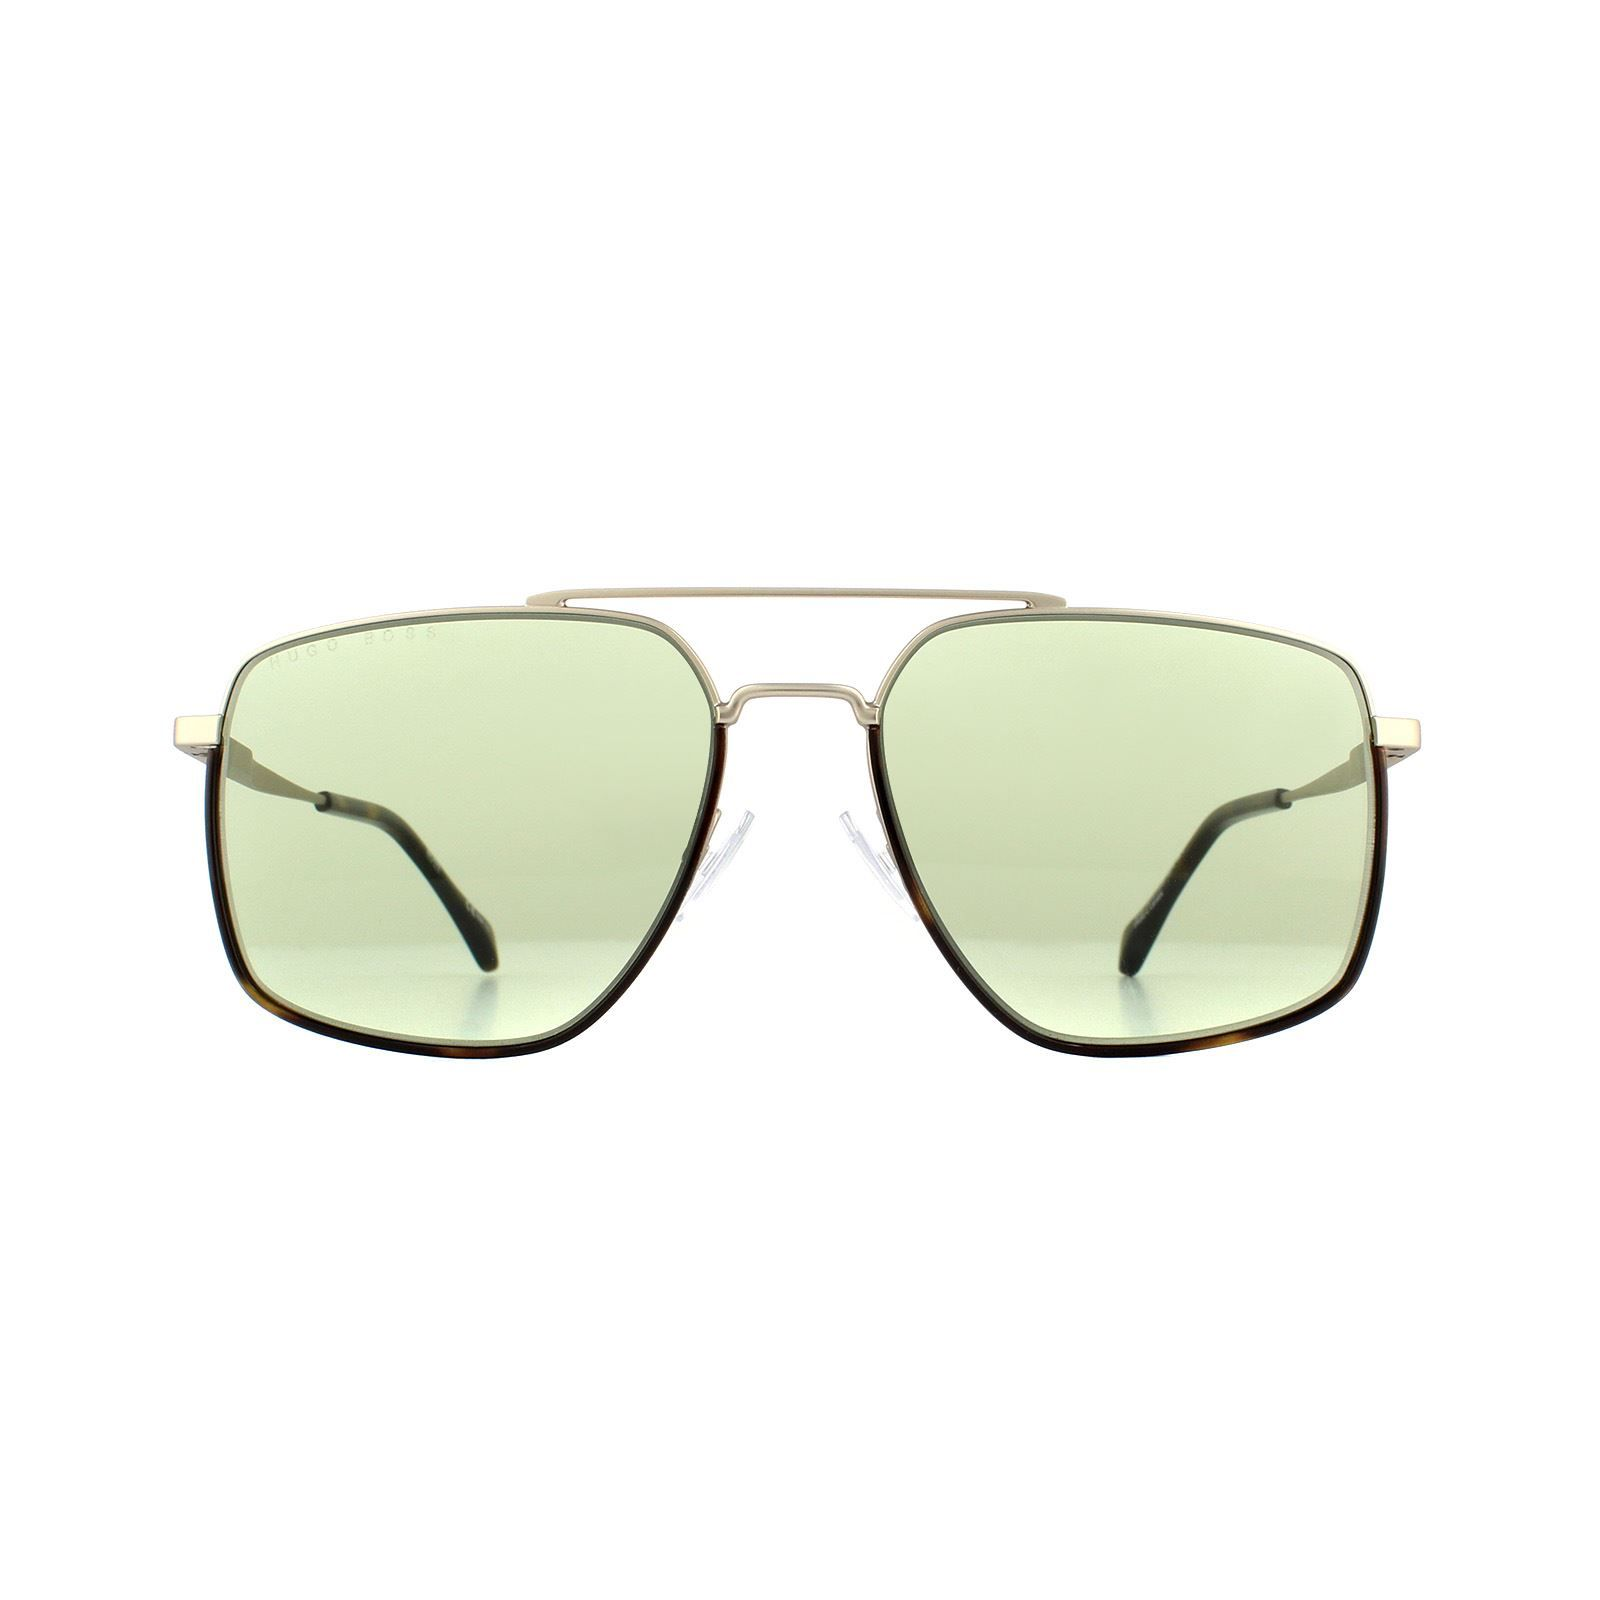 Hugo Boss Sunglasses 1091/S CGS GP Light Gold Green